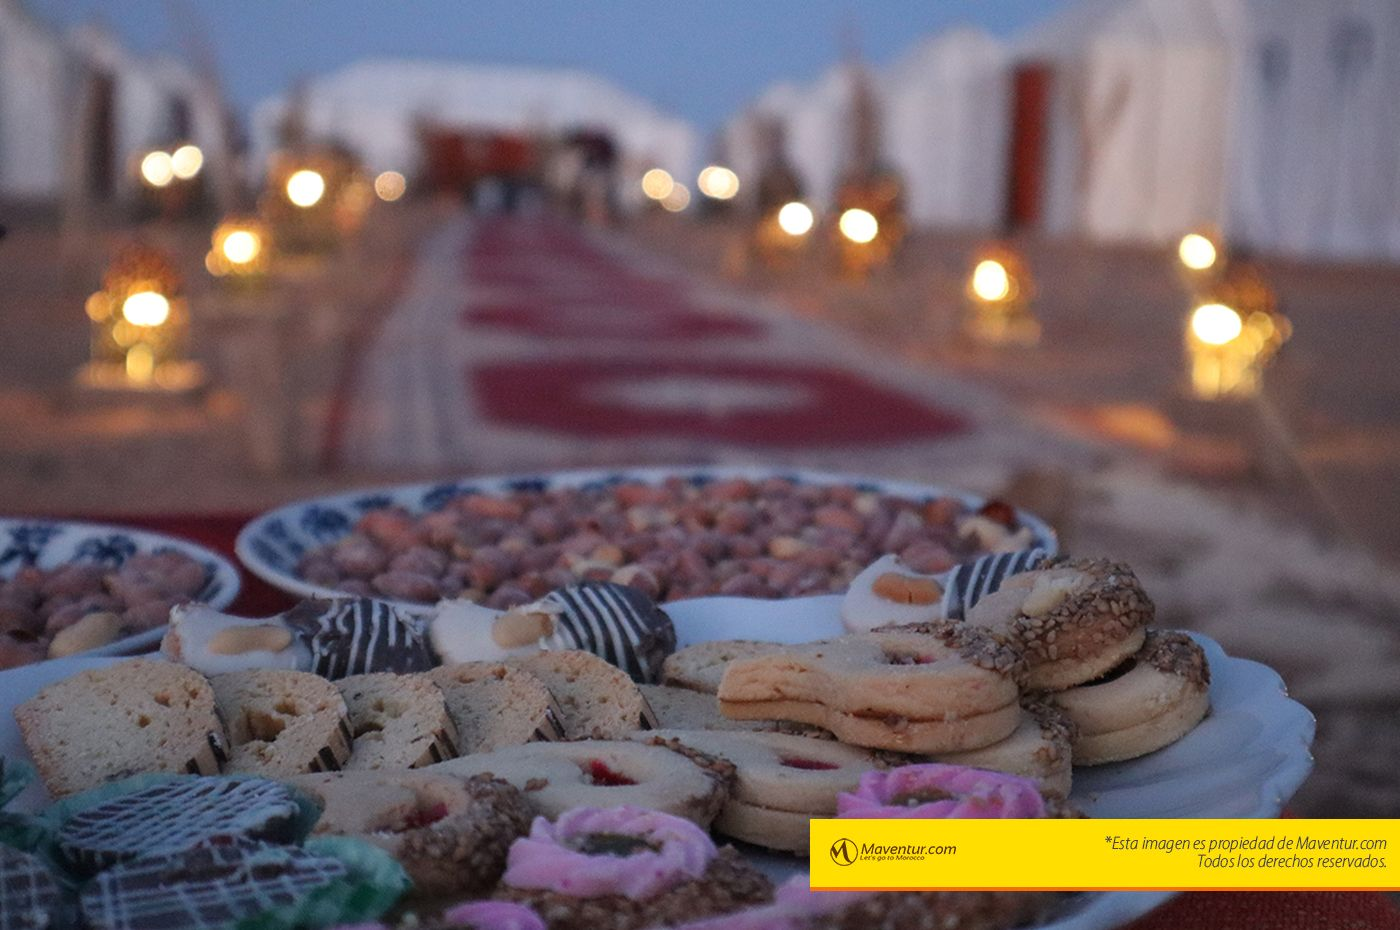 Maventur haimas lujo en sahara dulces y té